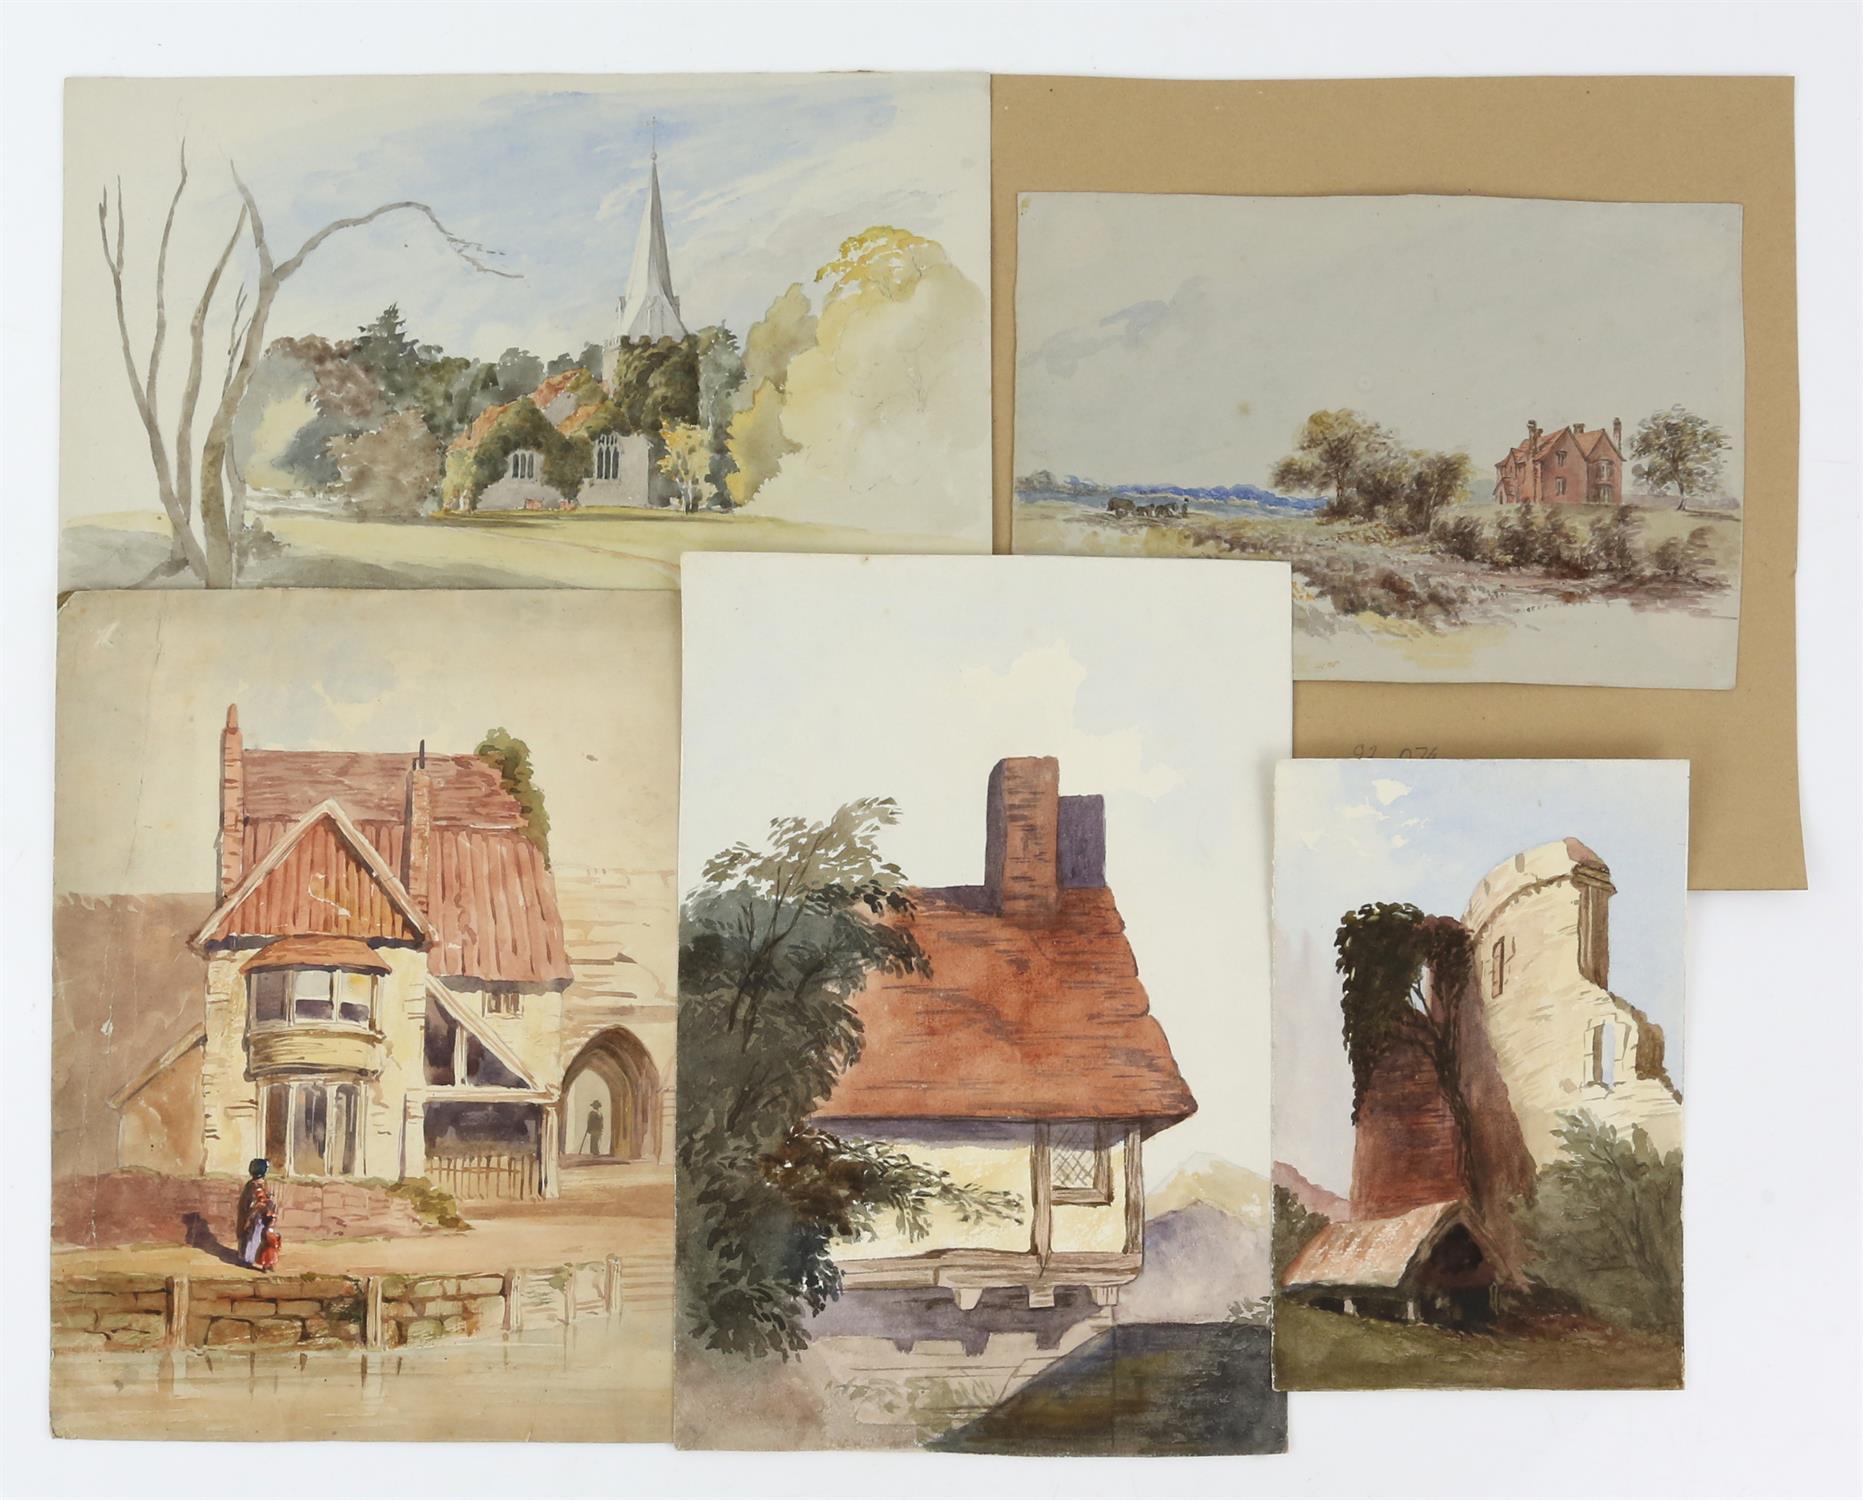 19th century British School, landscape with scene of a church, watercolour, 18cm x 26.5cm, 'St.